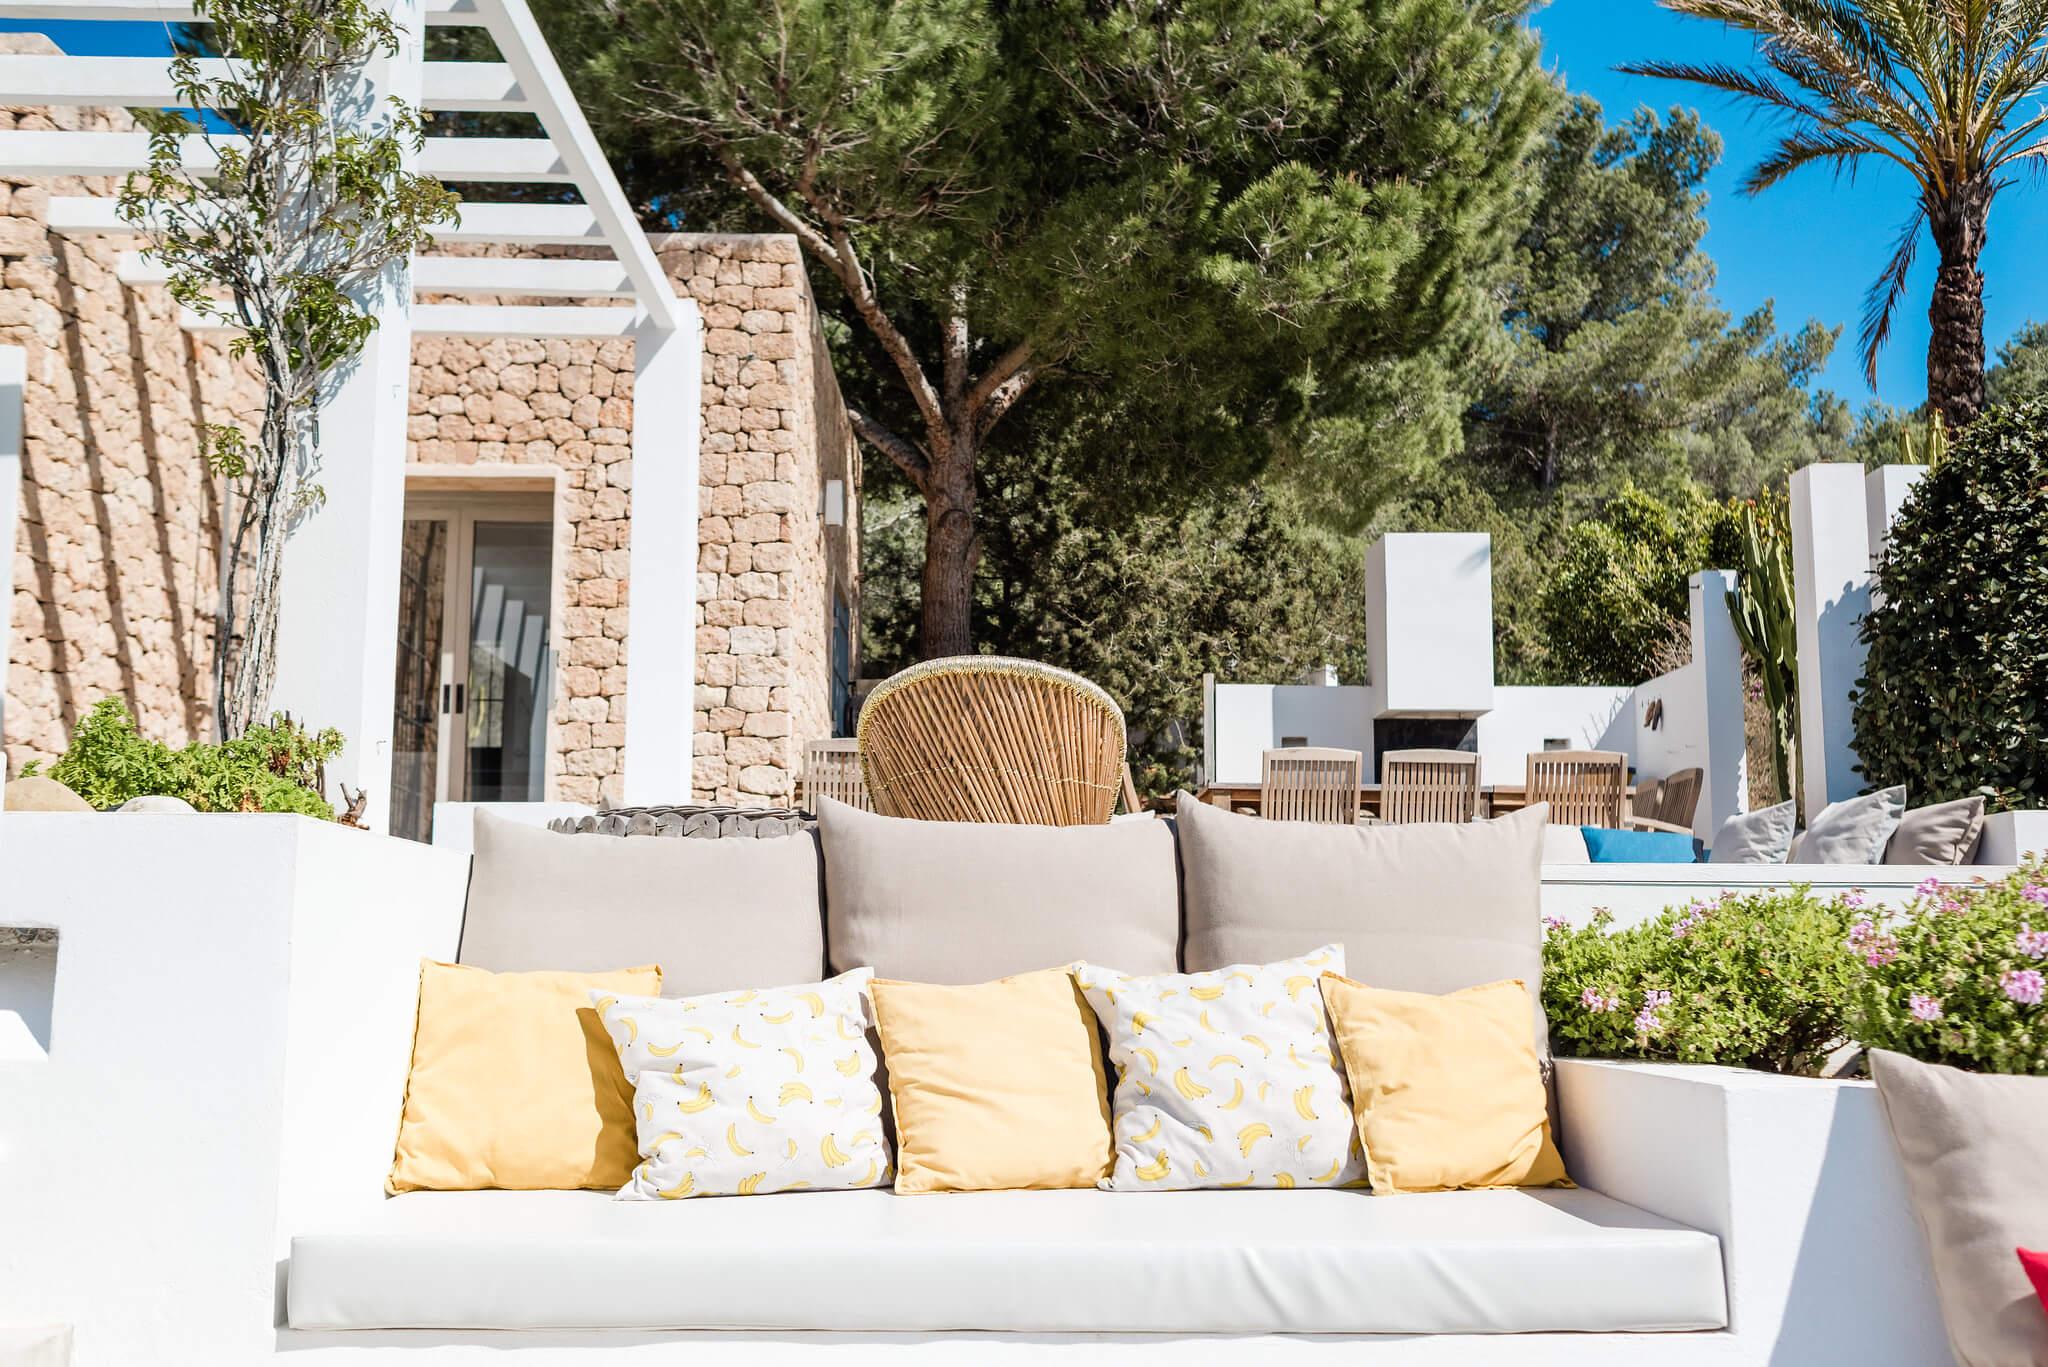 https://www.white-ibiza.com/wp-content/uploads/2020/06/white-ibiza-villas-casa-nyah-exterior-cushions.jpg